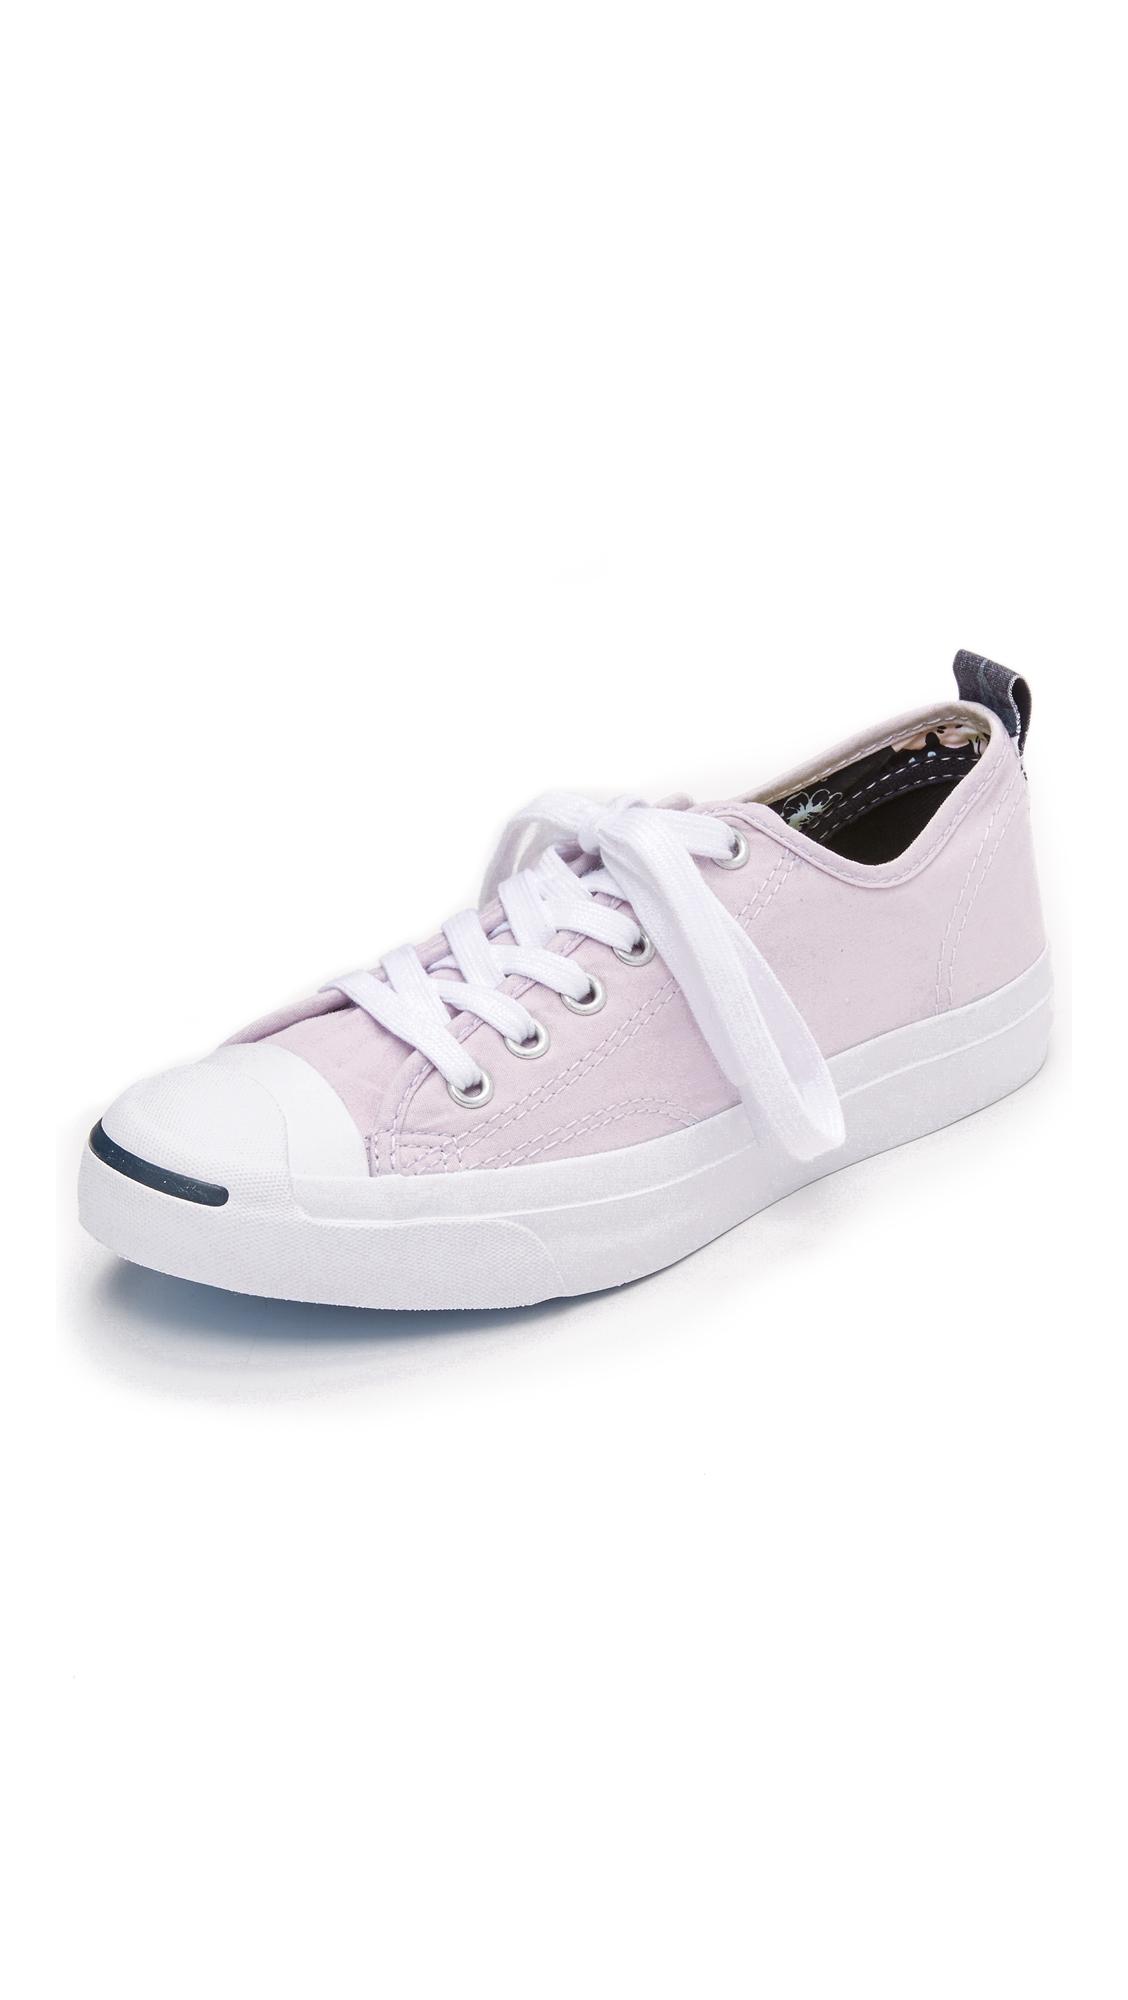 bf96cfa0c32c4b Lyst - Converse Jack Purcell Jack Hawaiian Twill Sneakers in Pink